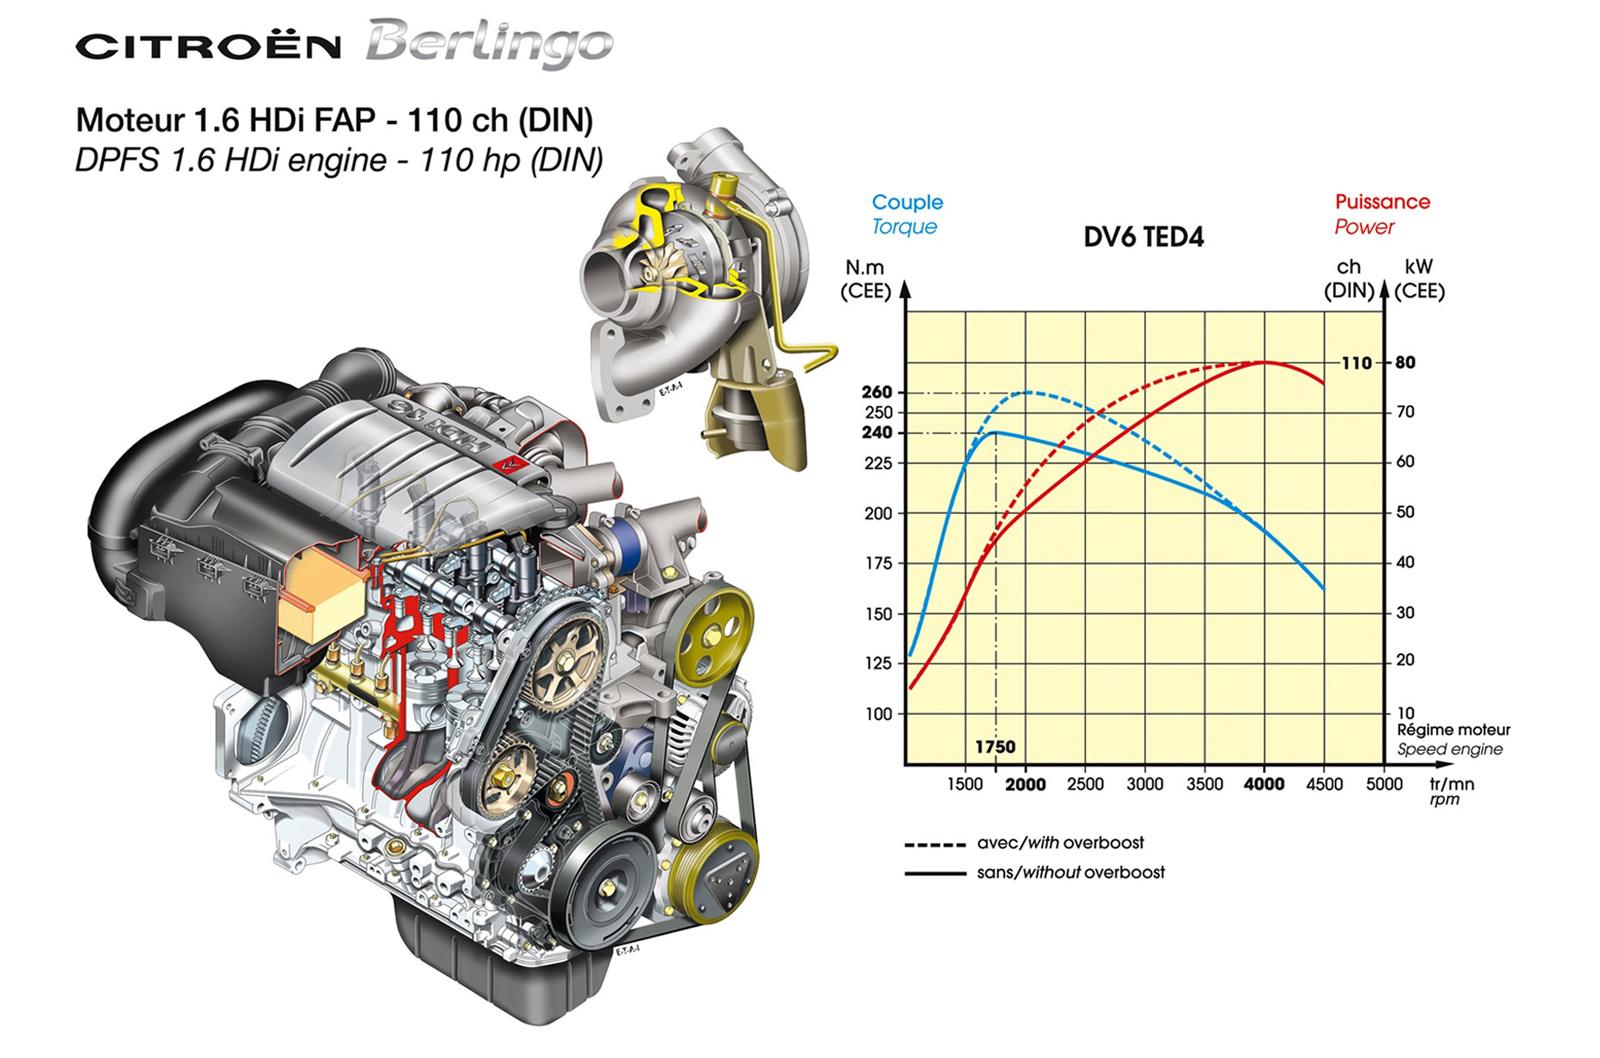 hight resolution of citroen berlingo multispace diagram of citroen berlingo engine at mazhai net